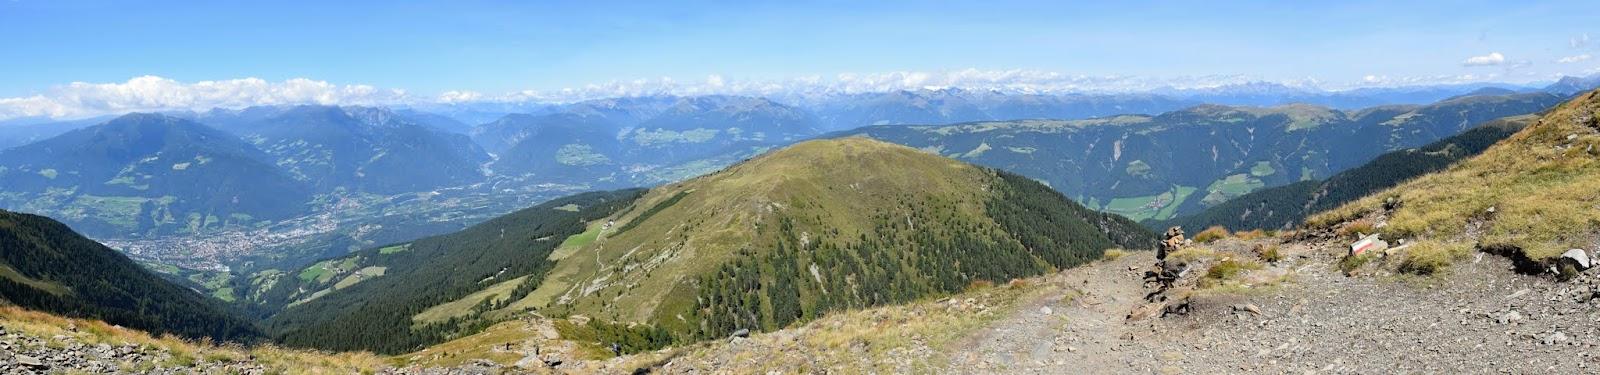 22.8. Z Brixen Plose, Rossalm -43.jpg